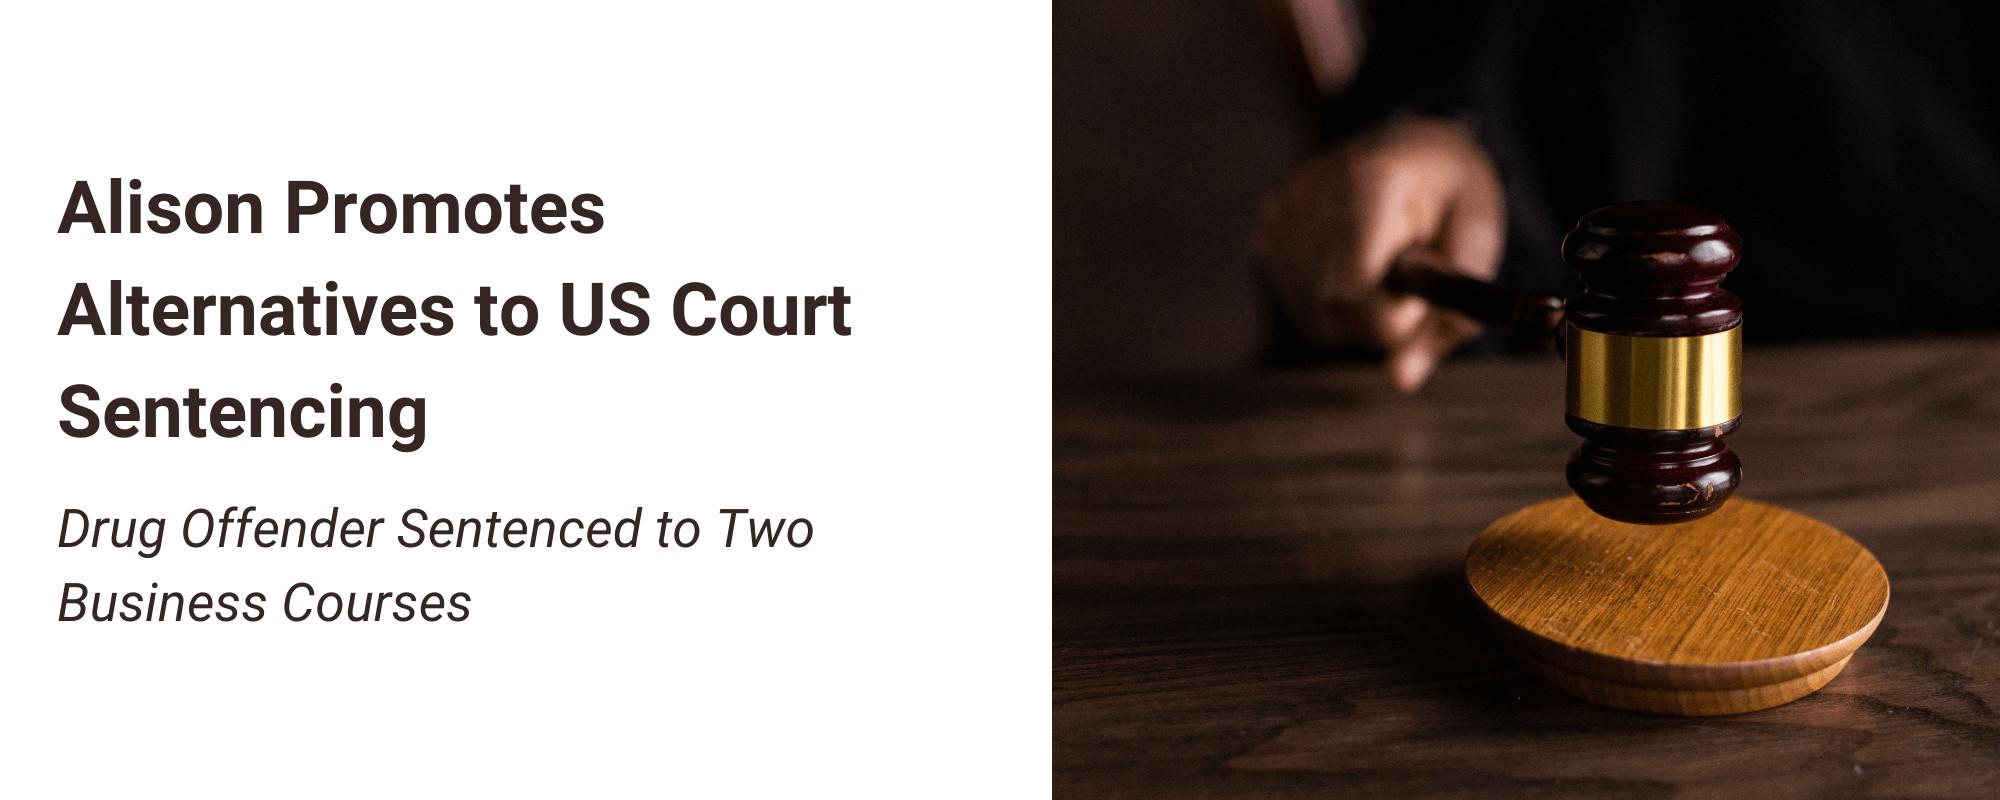 Alison Promotes Alternatives to US Court Sentencing